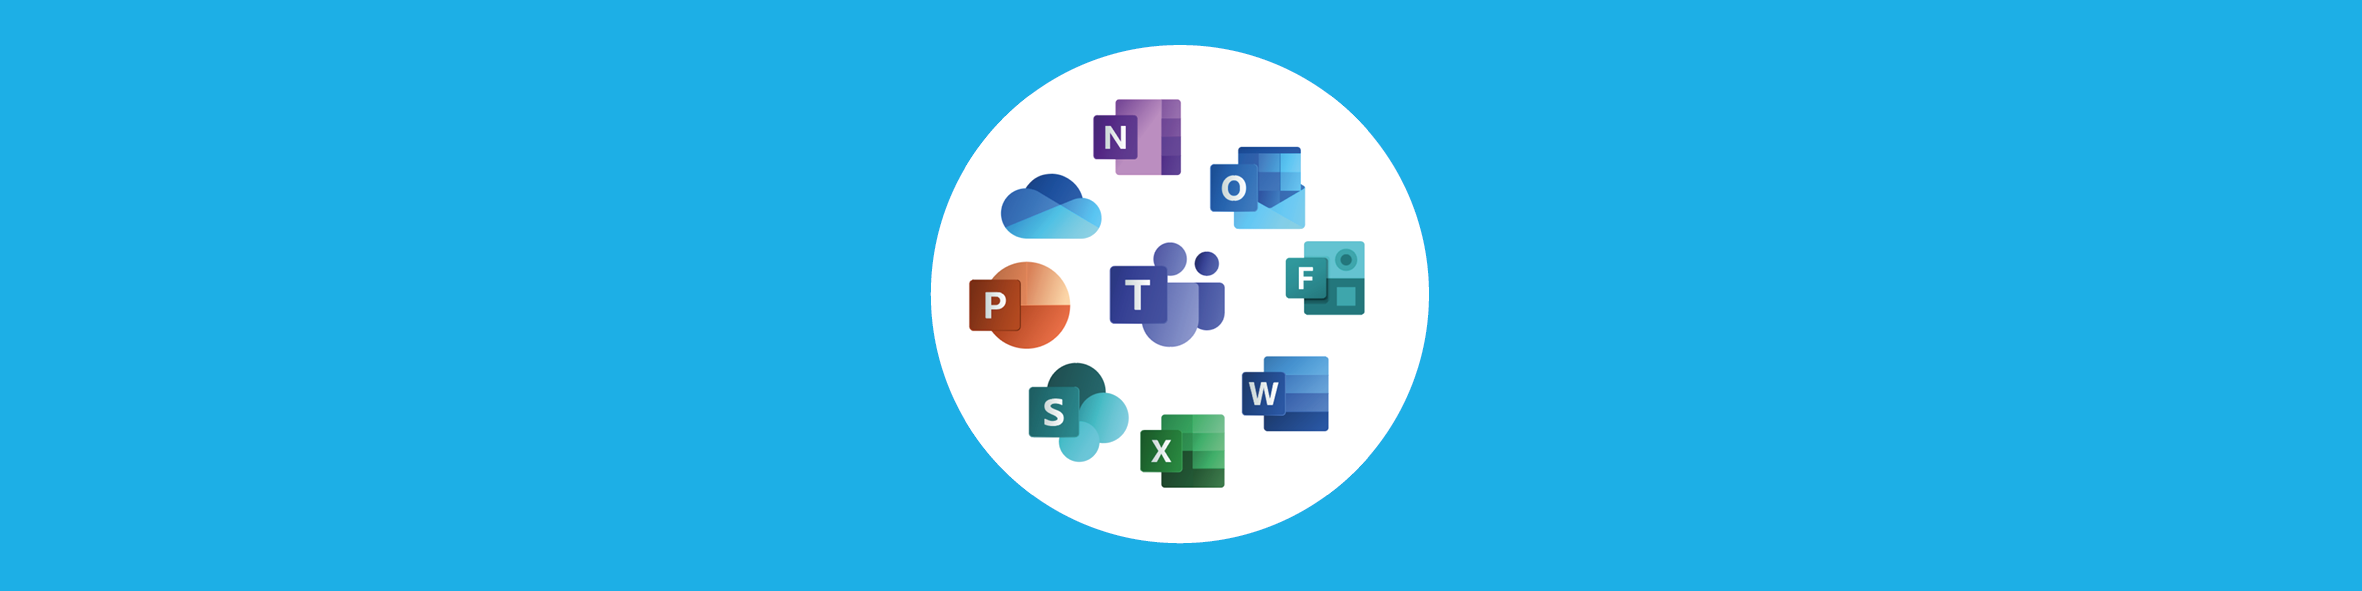 Microsoft 365 - Cloudwise Academy header trainingsaanbod